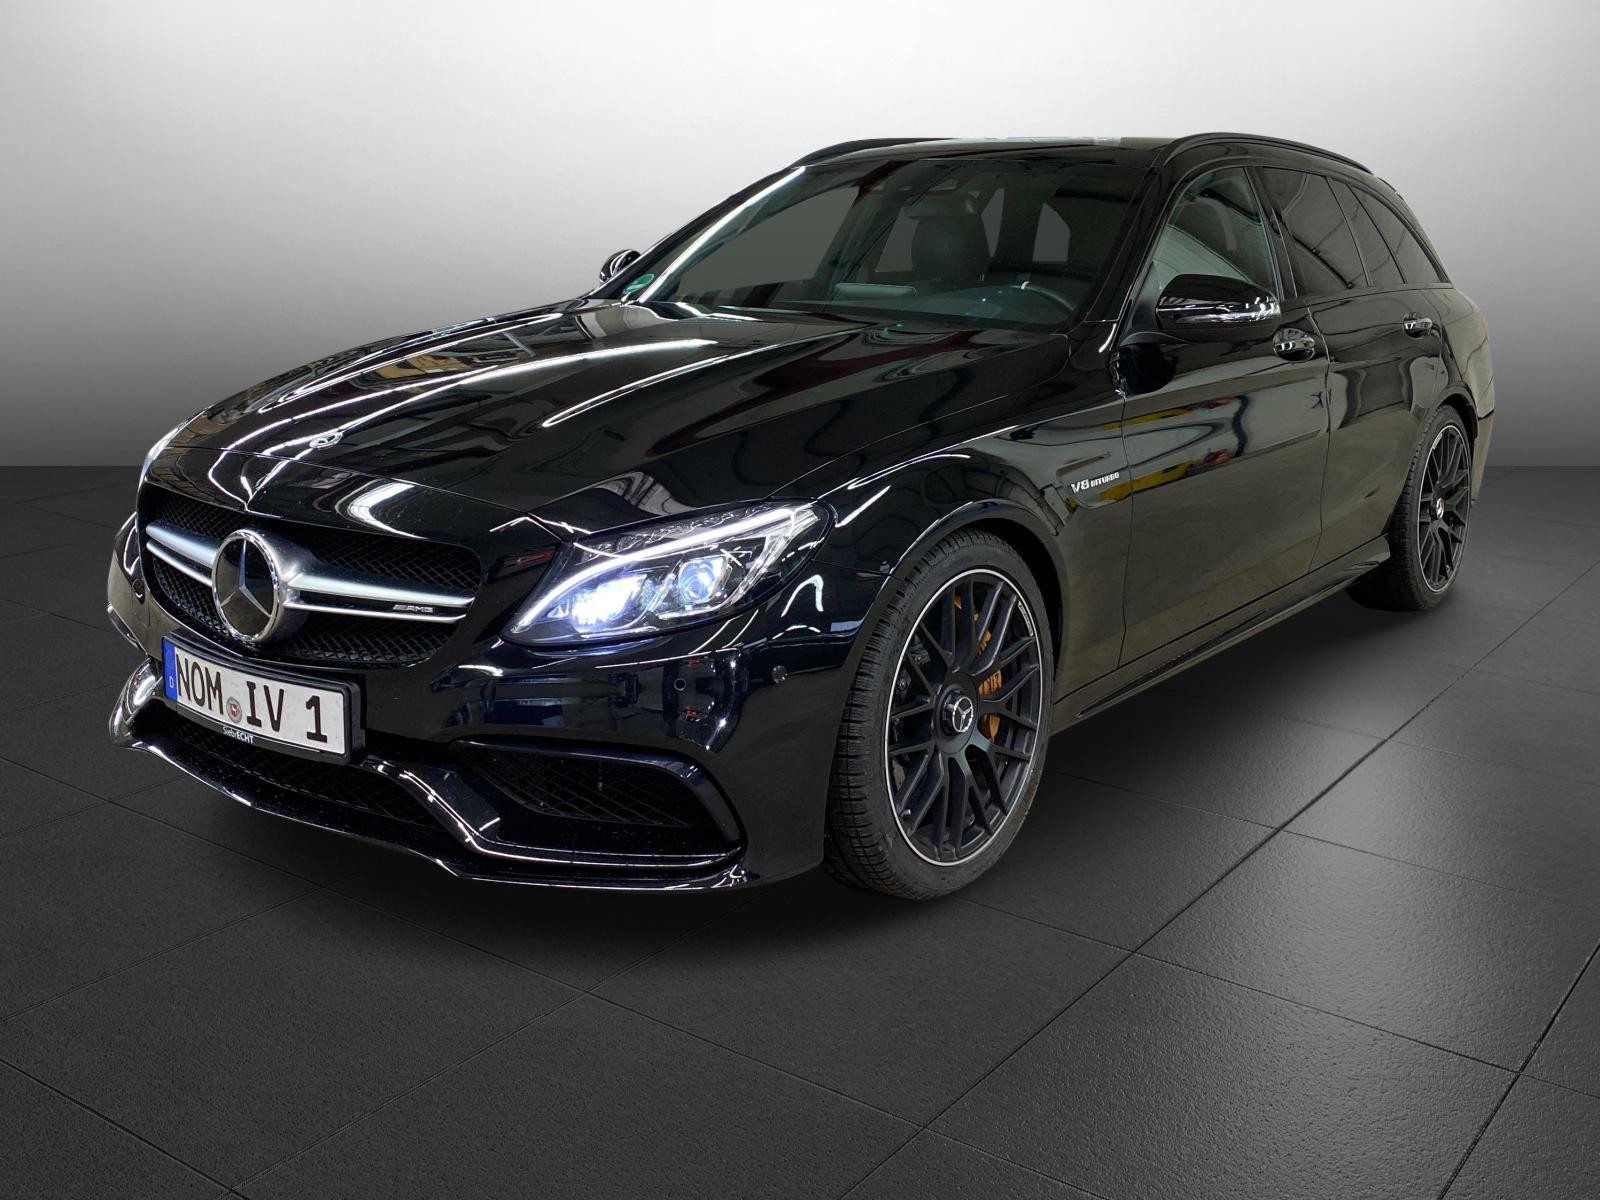 Mercedes-Benz C 63 S AMG T 4.0 V8 AT*Navi*Leder*Keramikb*, Jahr 2017, Benzin